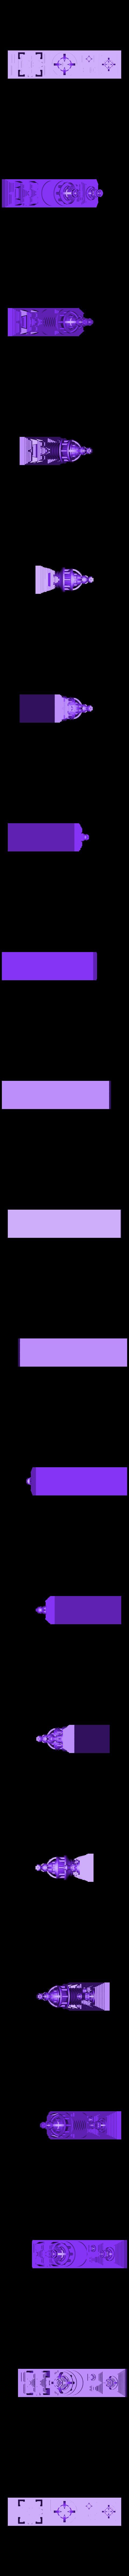 tetris_cities_I.stl Download free STL file Tetris Heart Puzzle • Design to 3D print, ferjerez3d